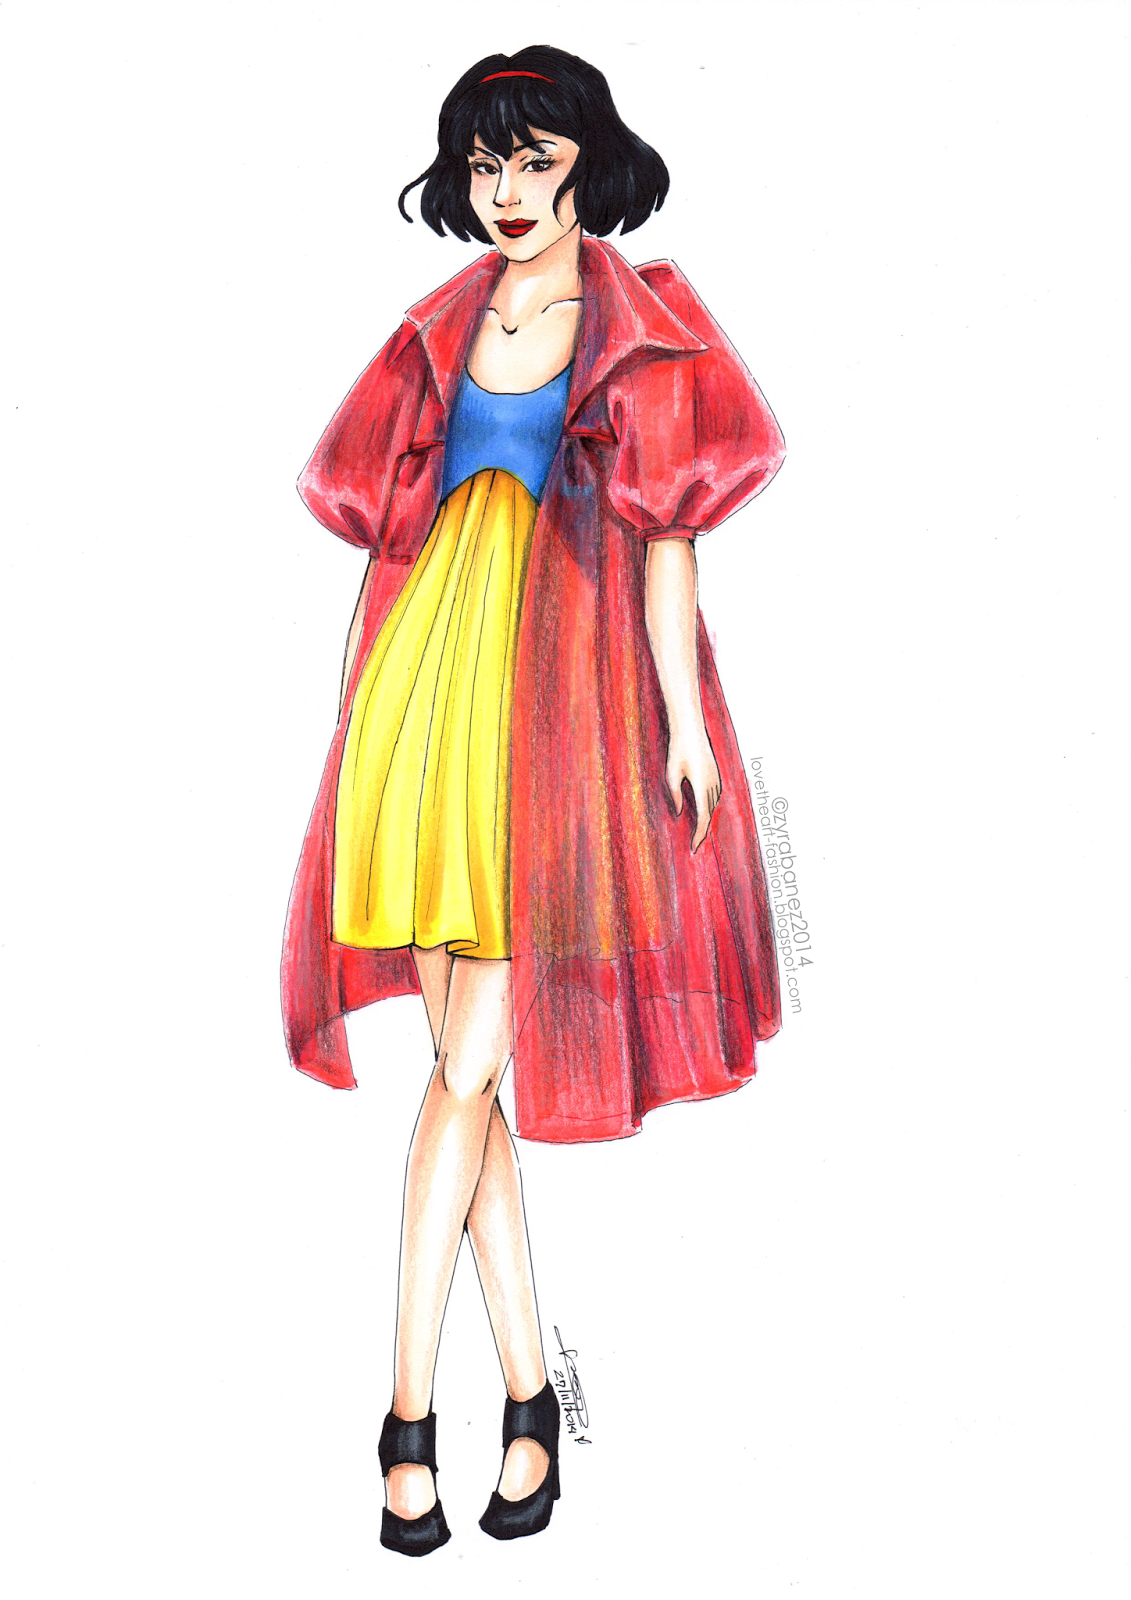 Lovetheart - Fashion Illustration Princess Snow White